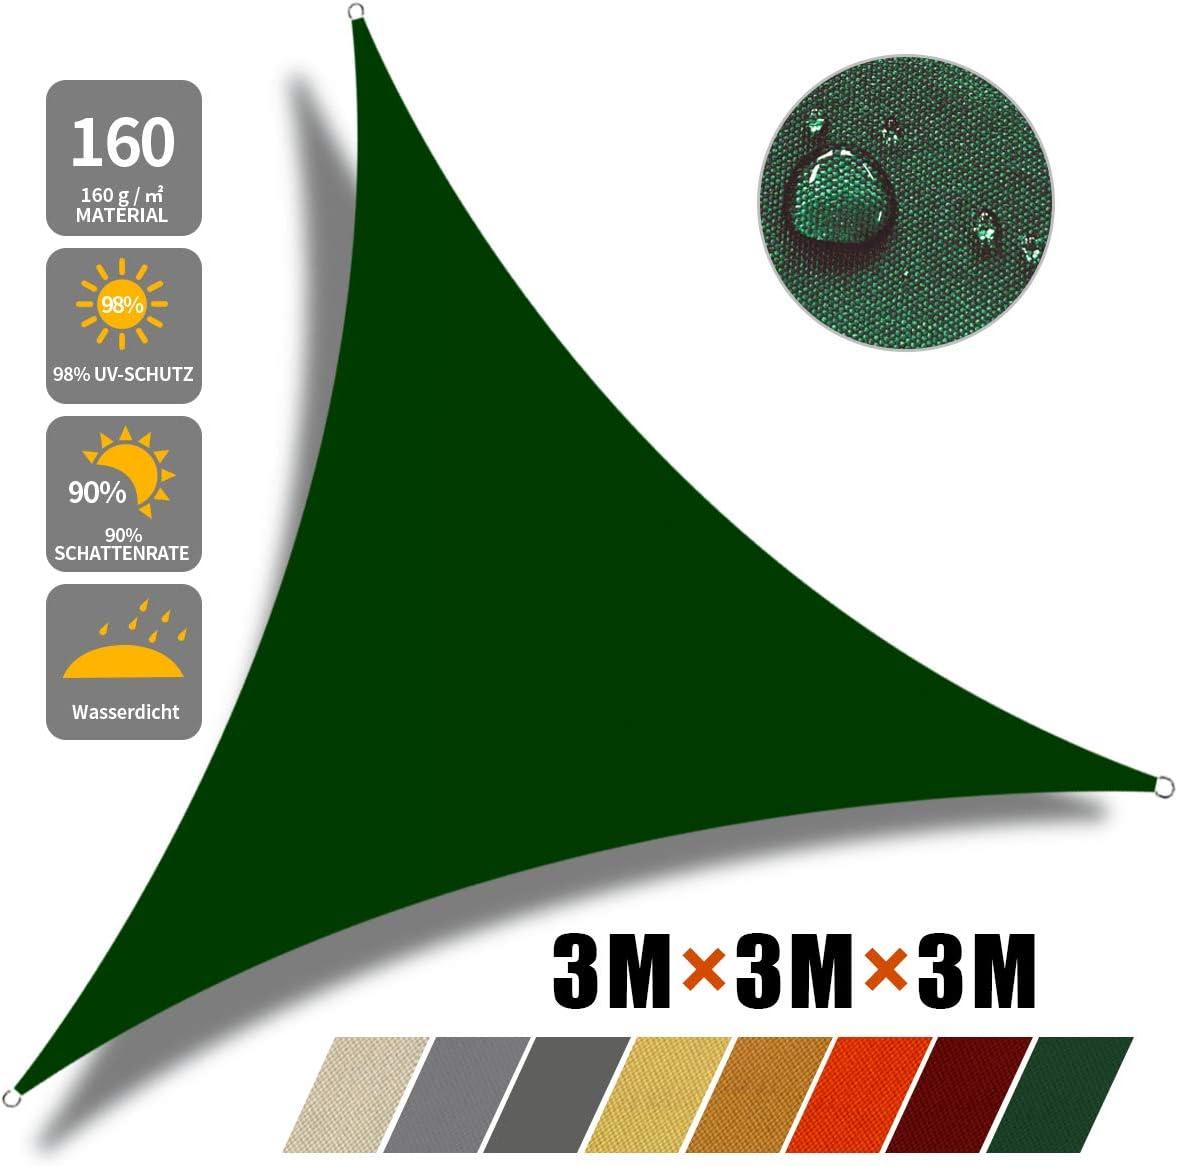 2/×2/×2m, Dunkelgr/ün Sonnensegel Sonnenschutz Sonnensegel/Wasserdicht UV-Schutz Polyester Sonnensegel f/ür Garten Balkon Terrasse Camping JYYnet Sonnensegel